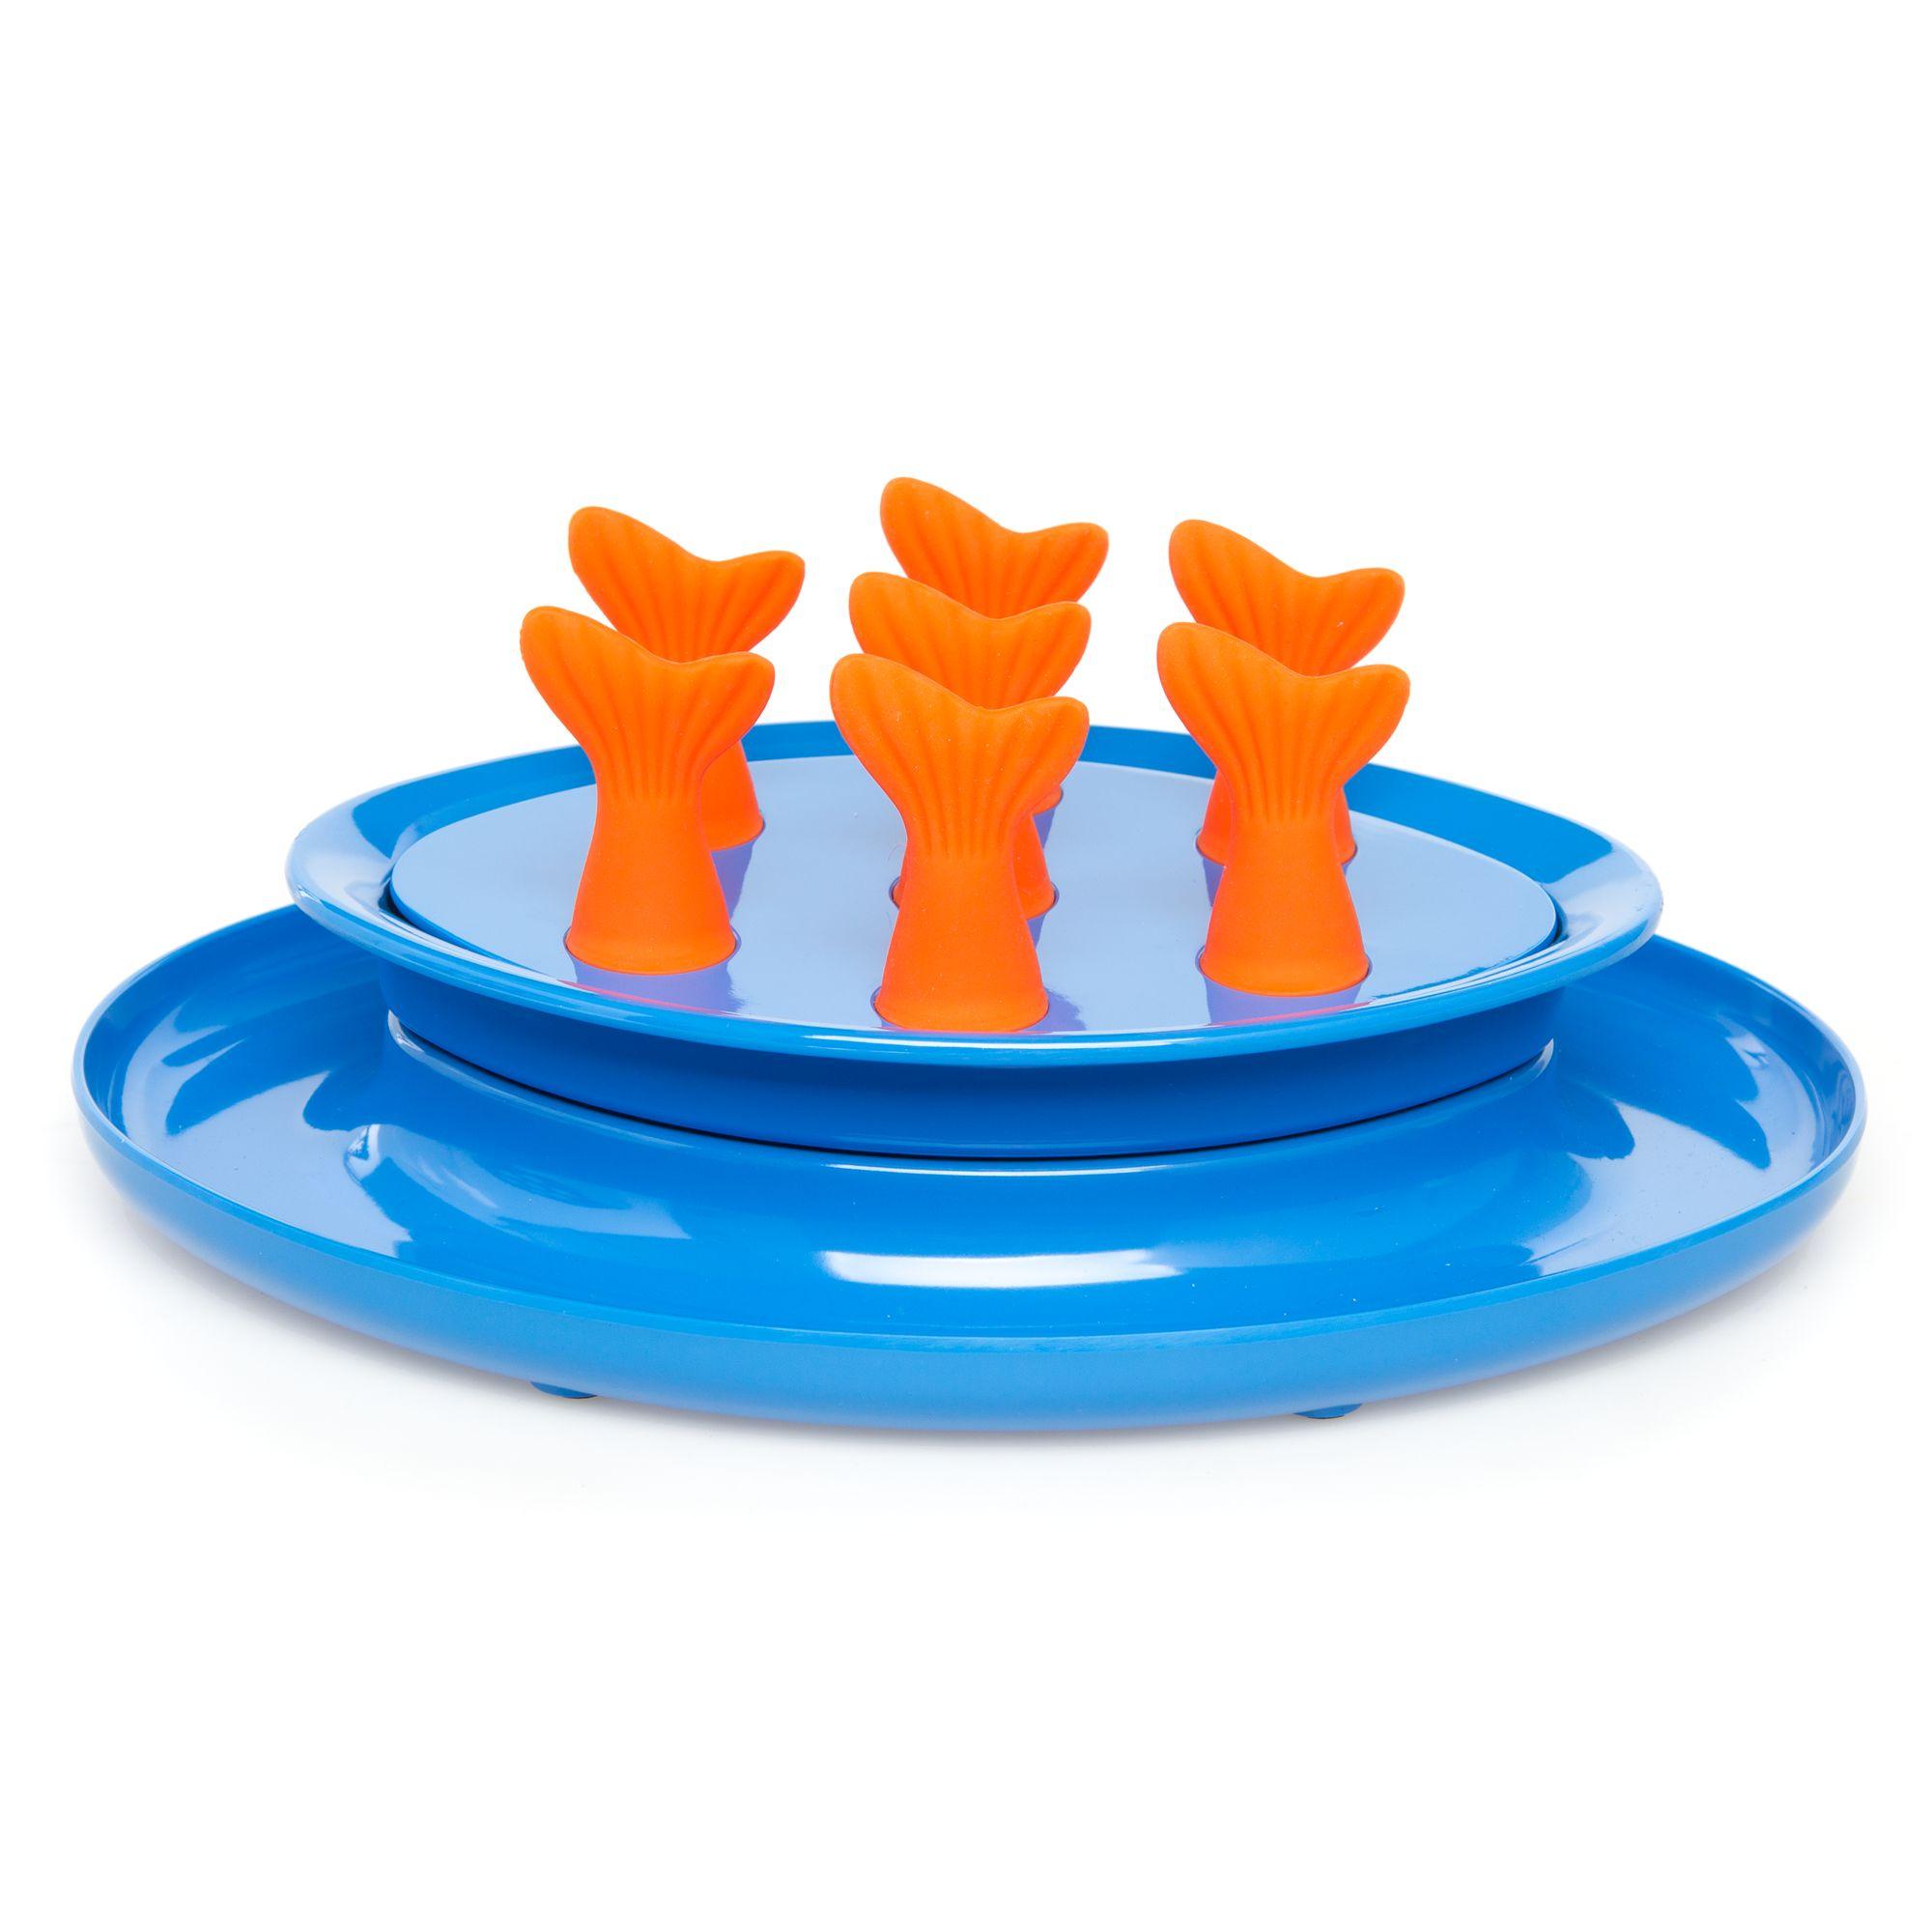 Jackson Galaxy Go Fish Puzzle Bowl Cat Toy 5264480